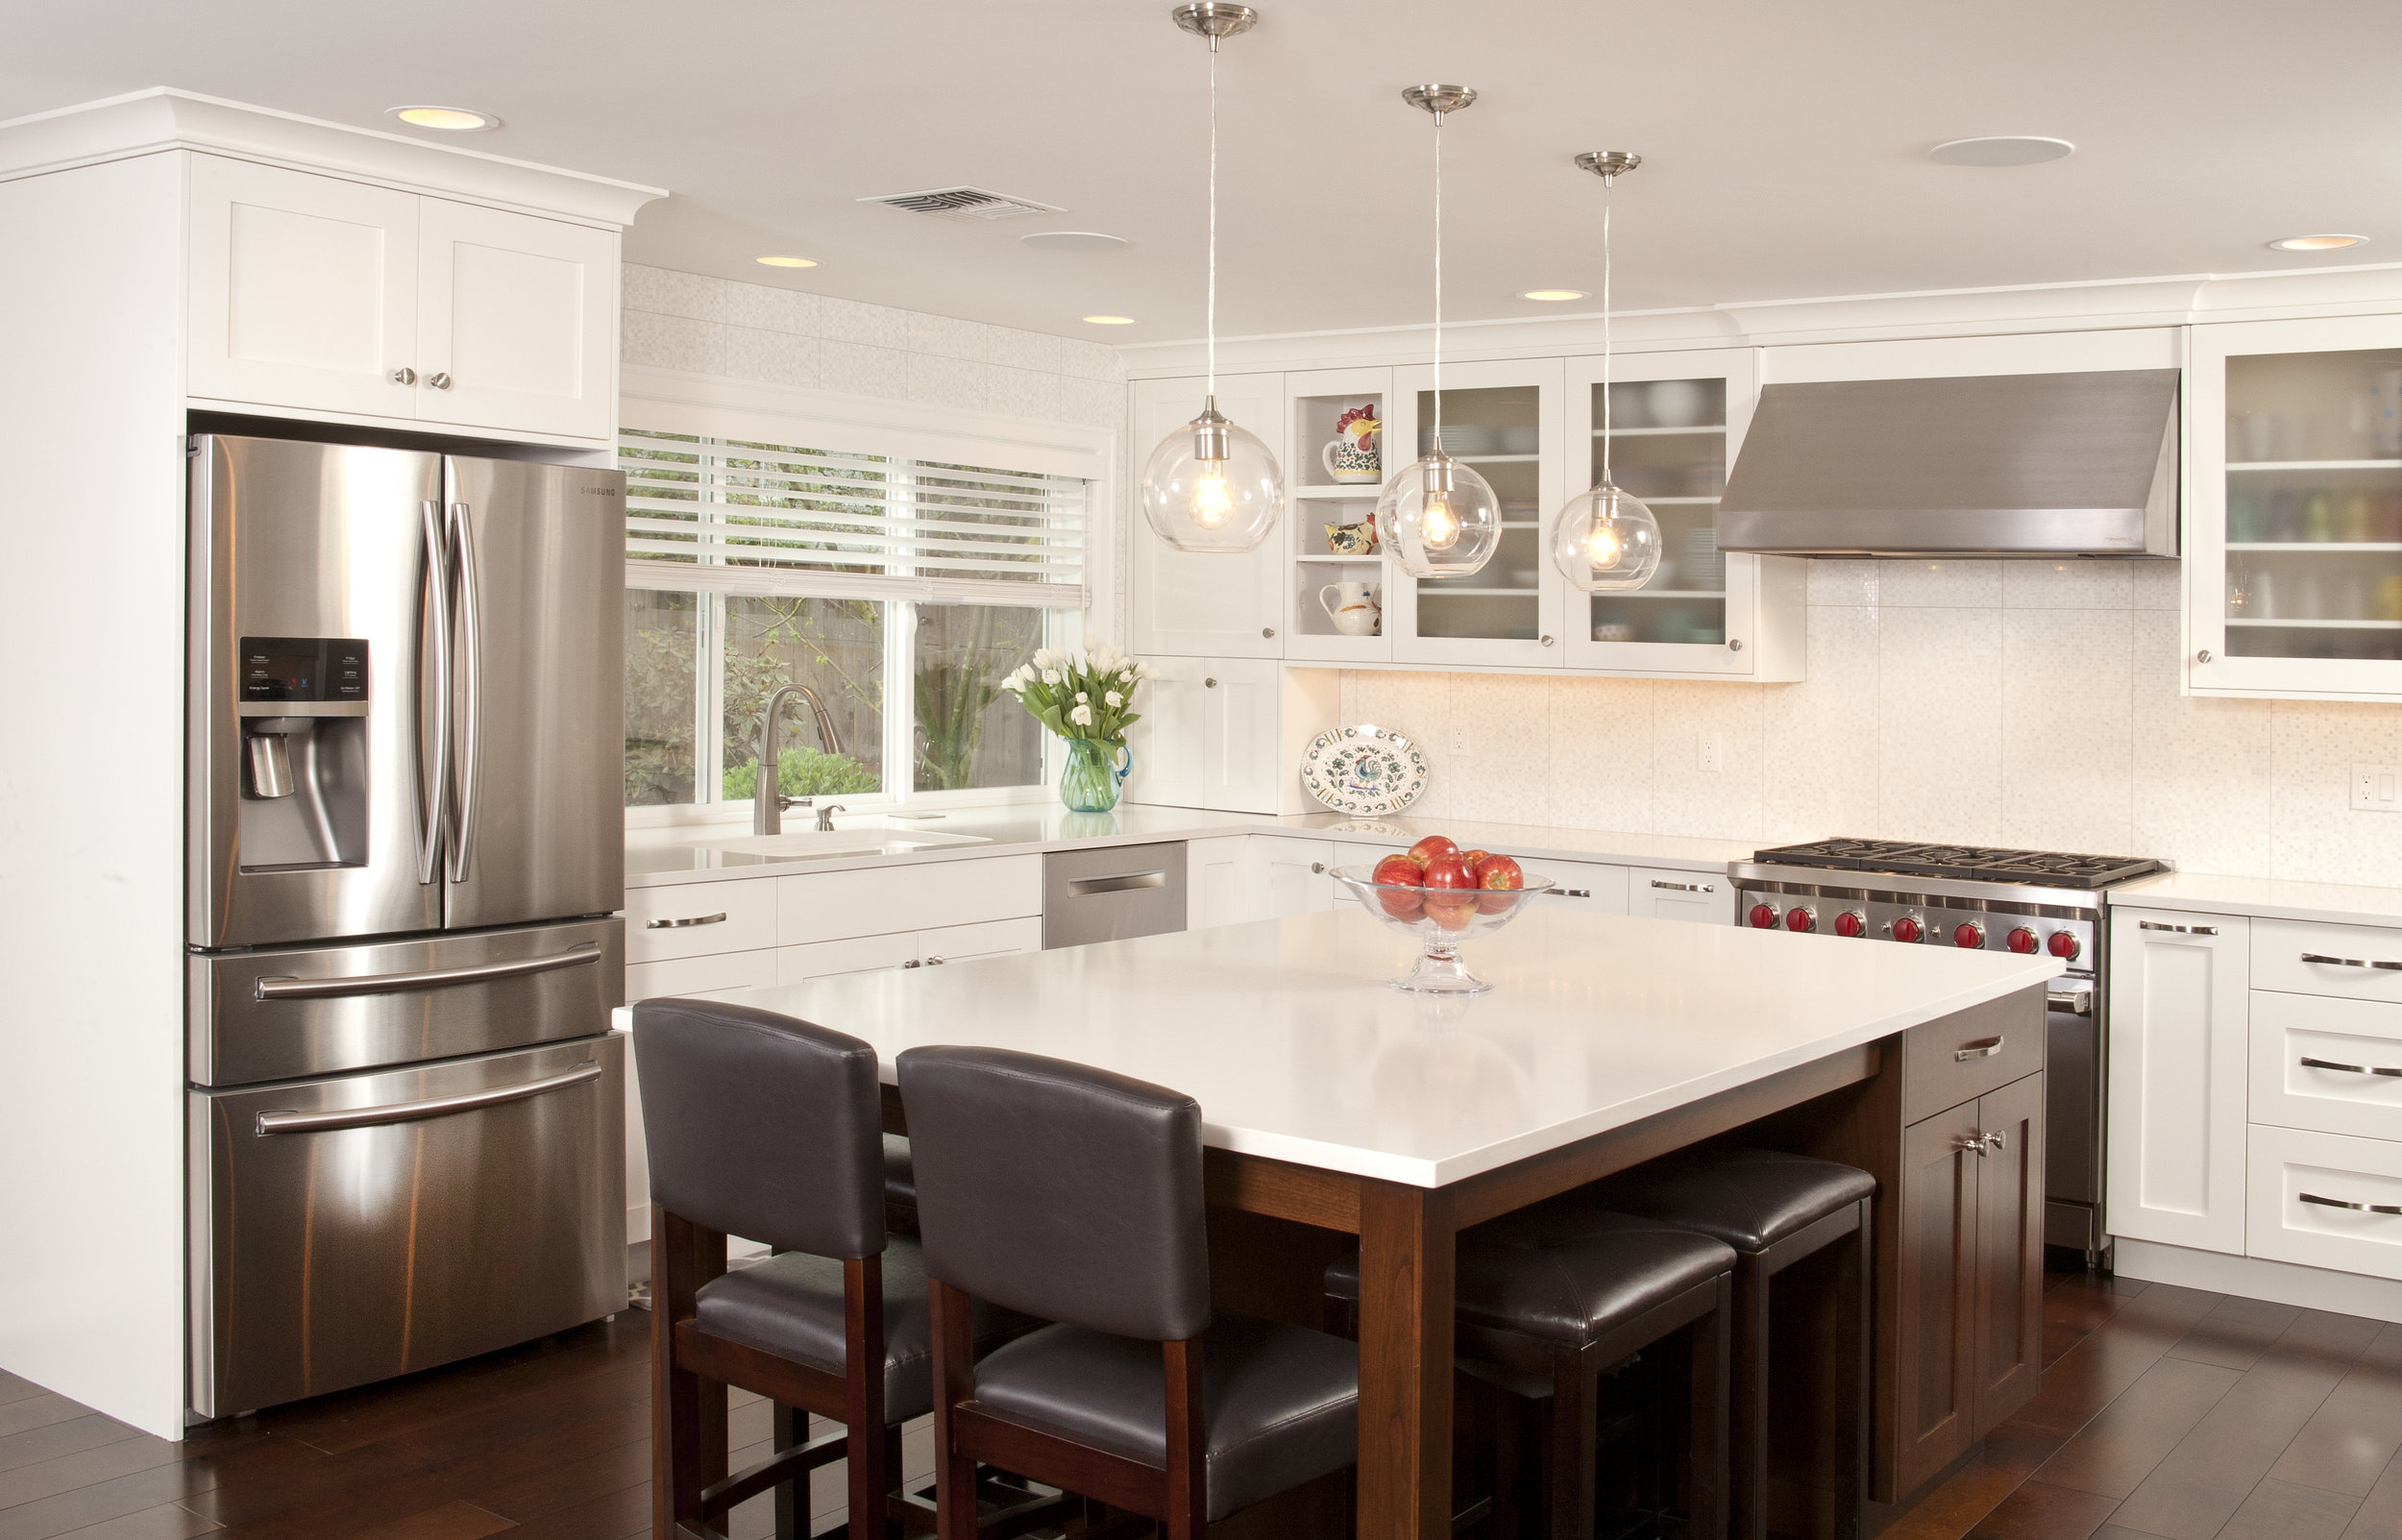 Bellevue Newport Shores Transitional Kitchen 3.jpg